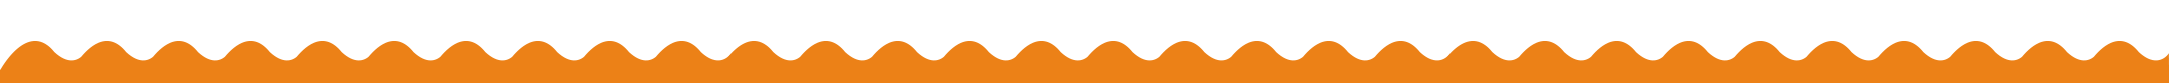 separador-naranja